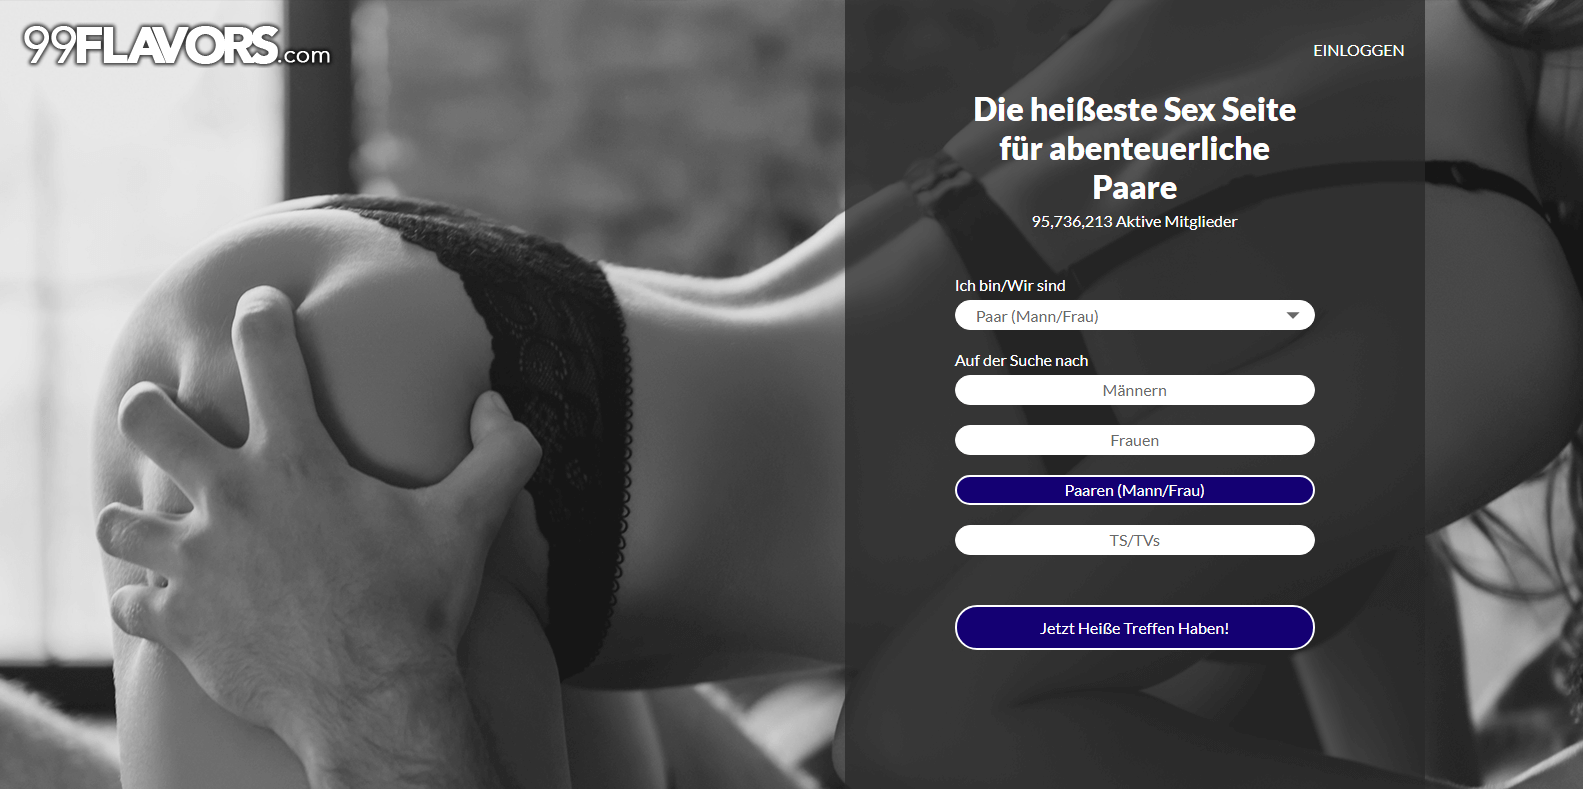 99flavors.com Anmeldung